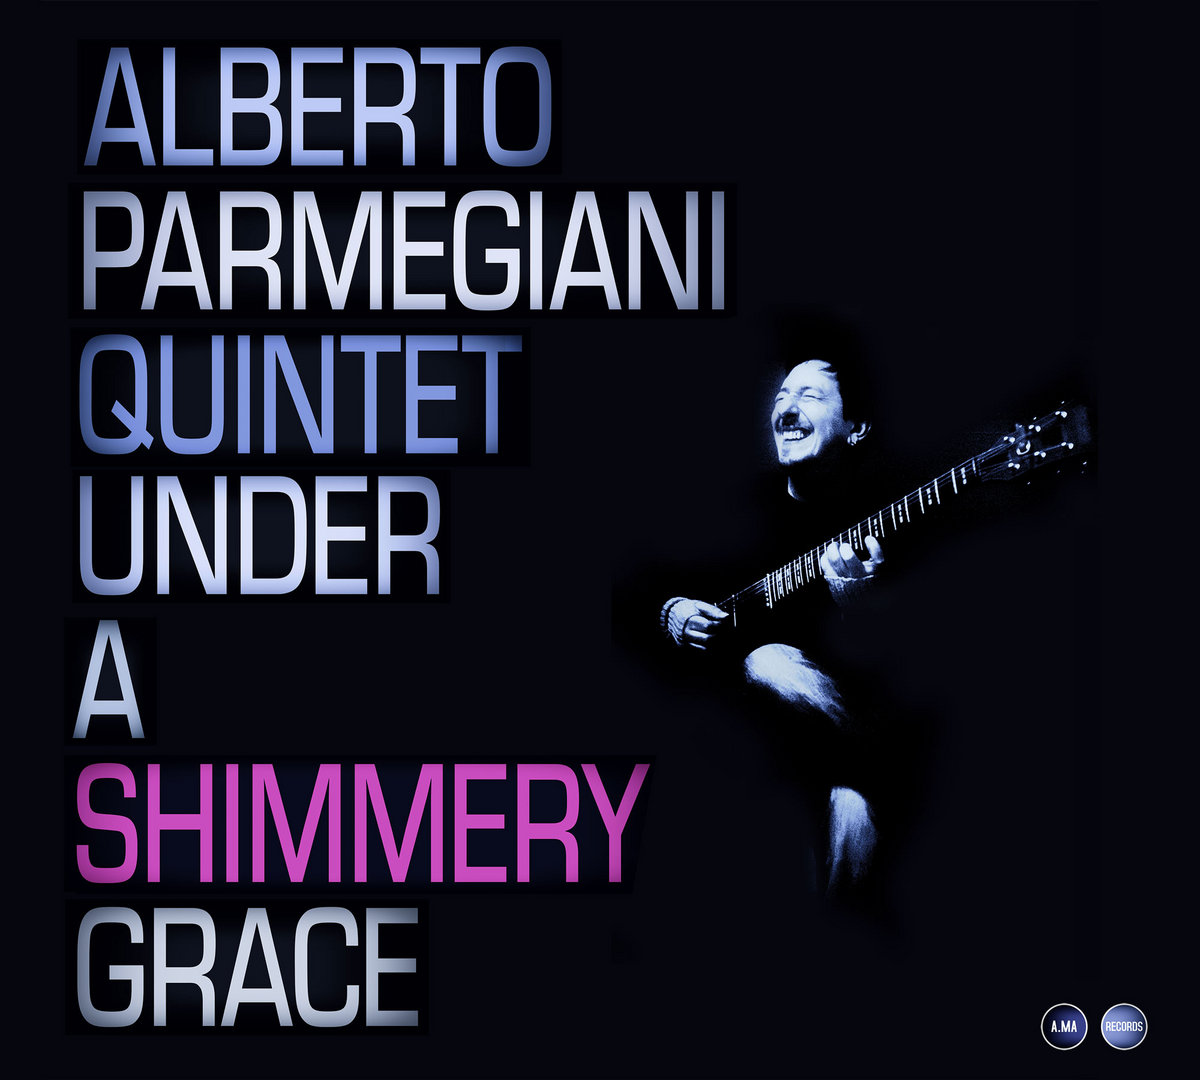 Alberto Parmemgiani Quintet - Under A Shimmery Grace